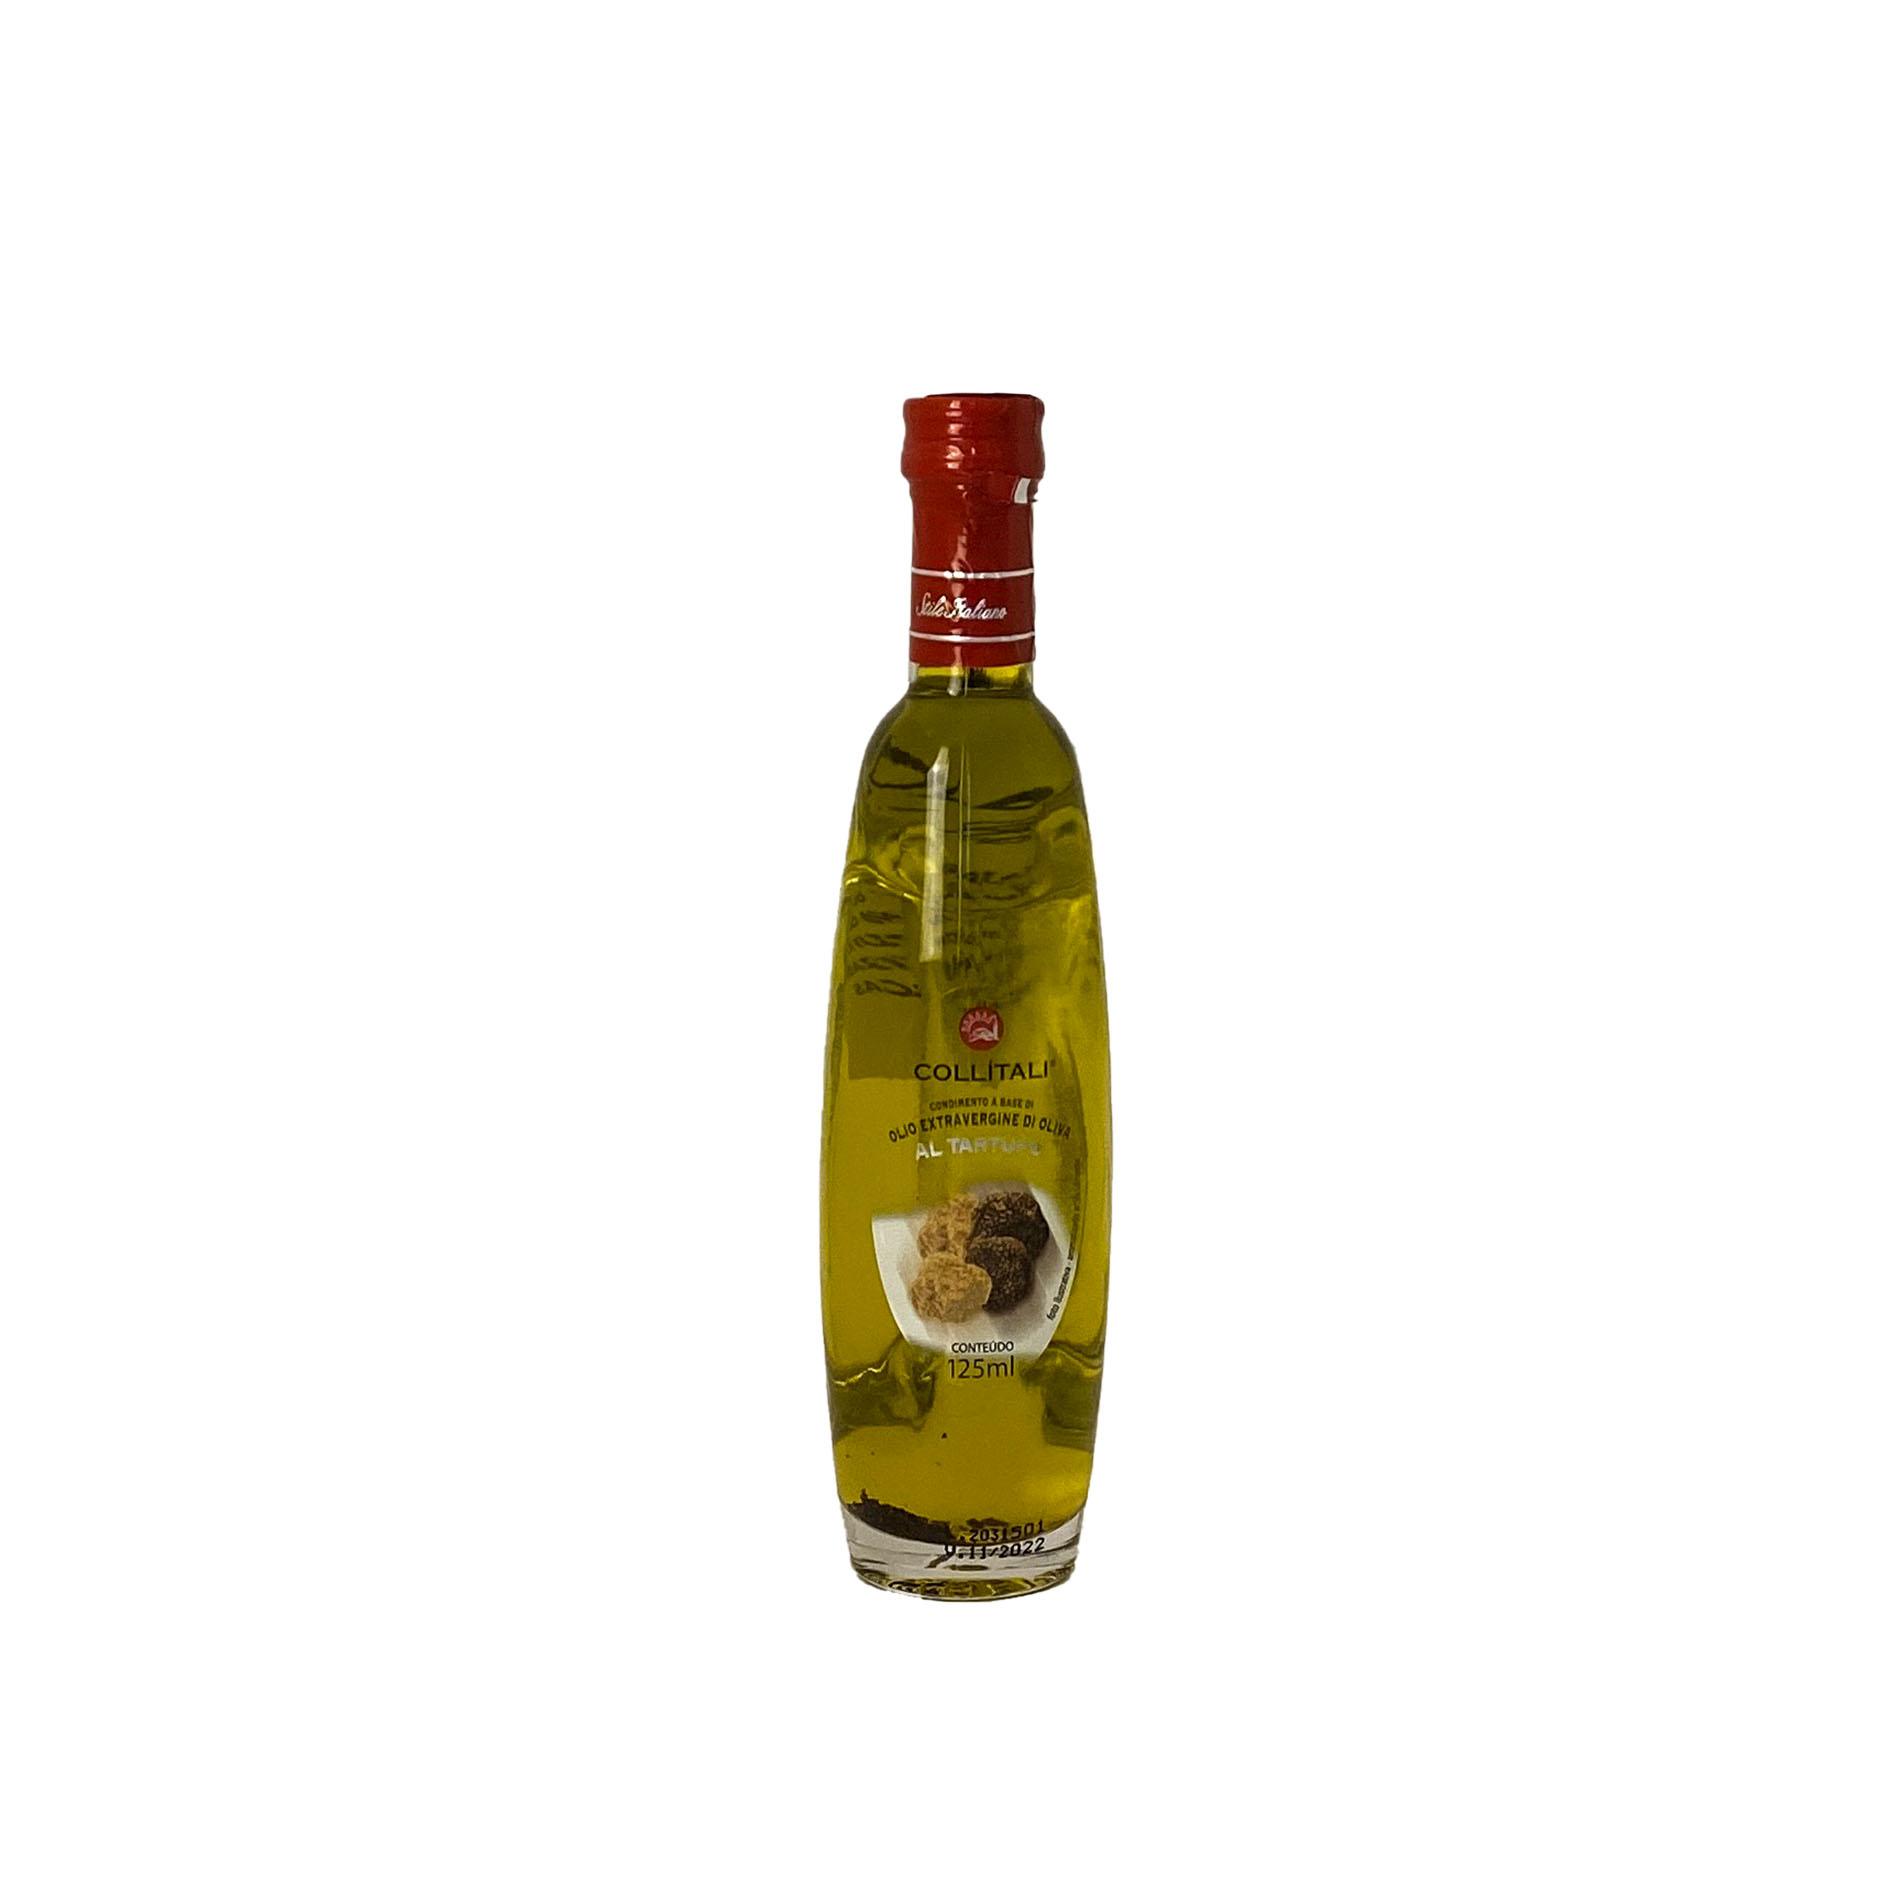 Azeite Extra Virgem Com Trufa Branca Collítali  - Vinerize